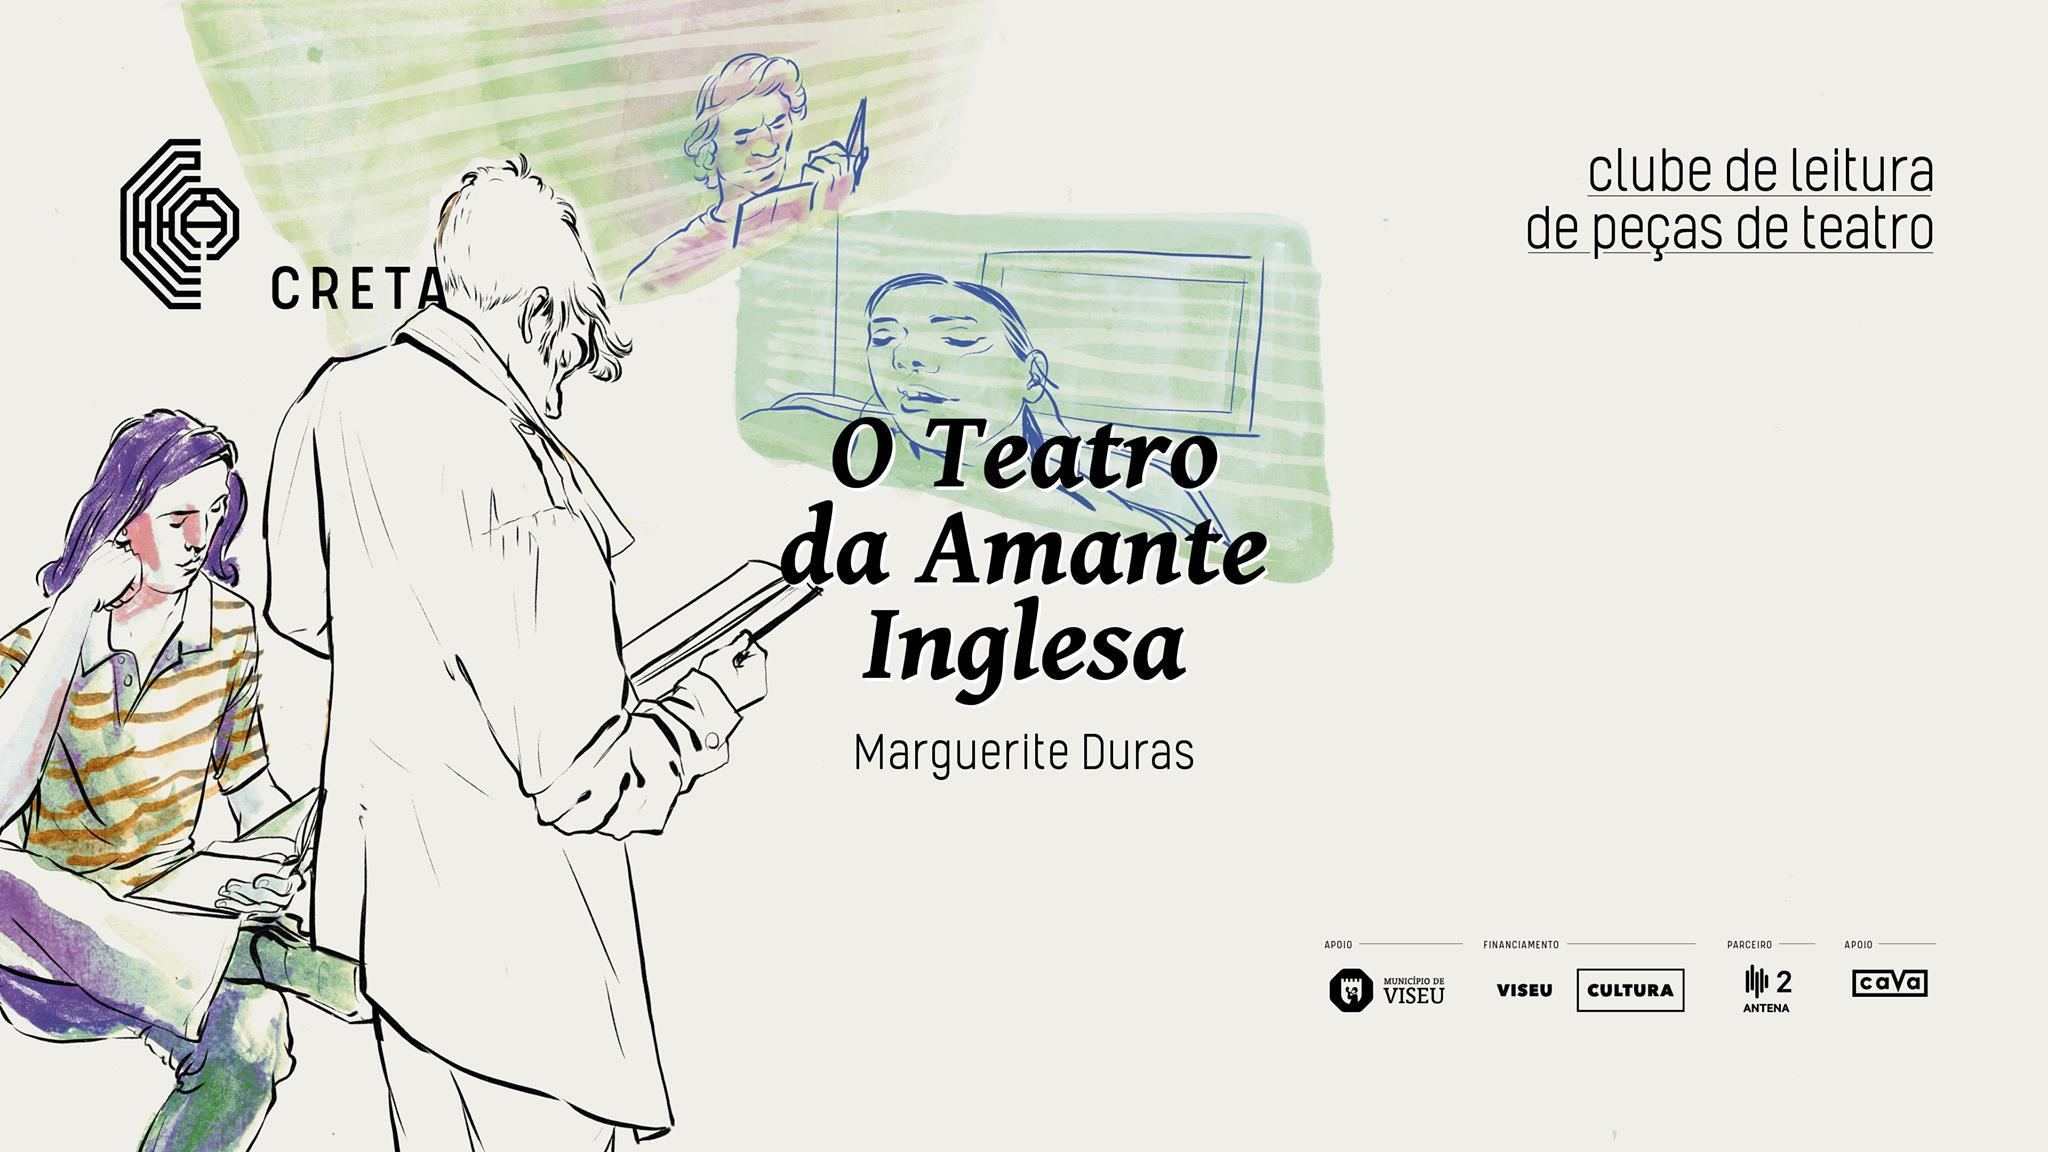 Clube de Leitura de Peças de Teatro: 'O Teatro da Amante Inglesa' de Marguerite Duras